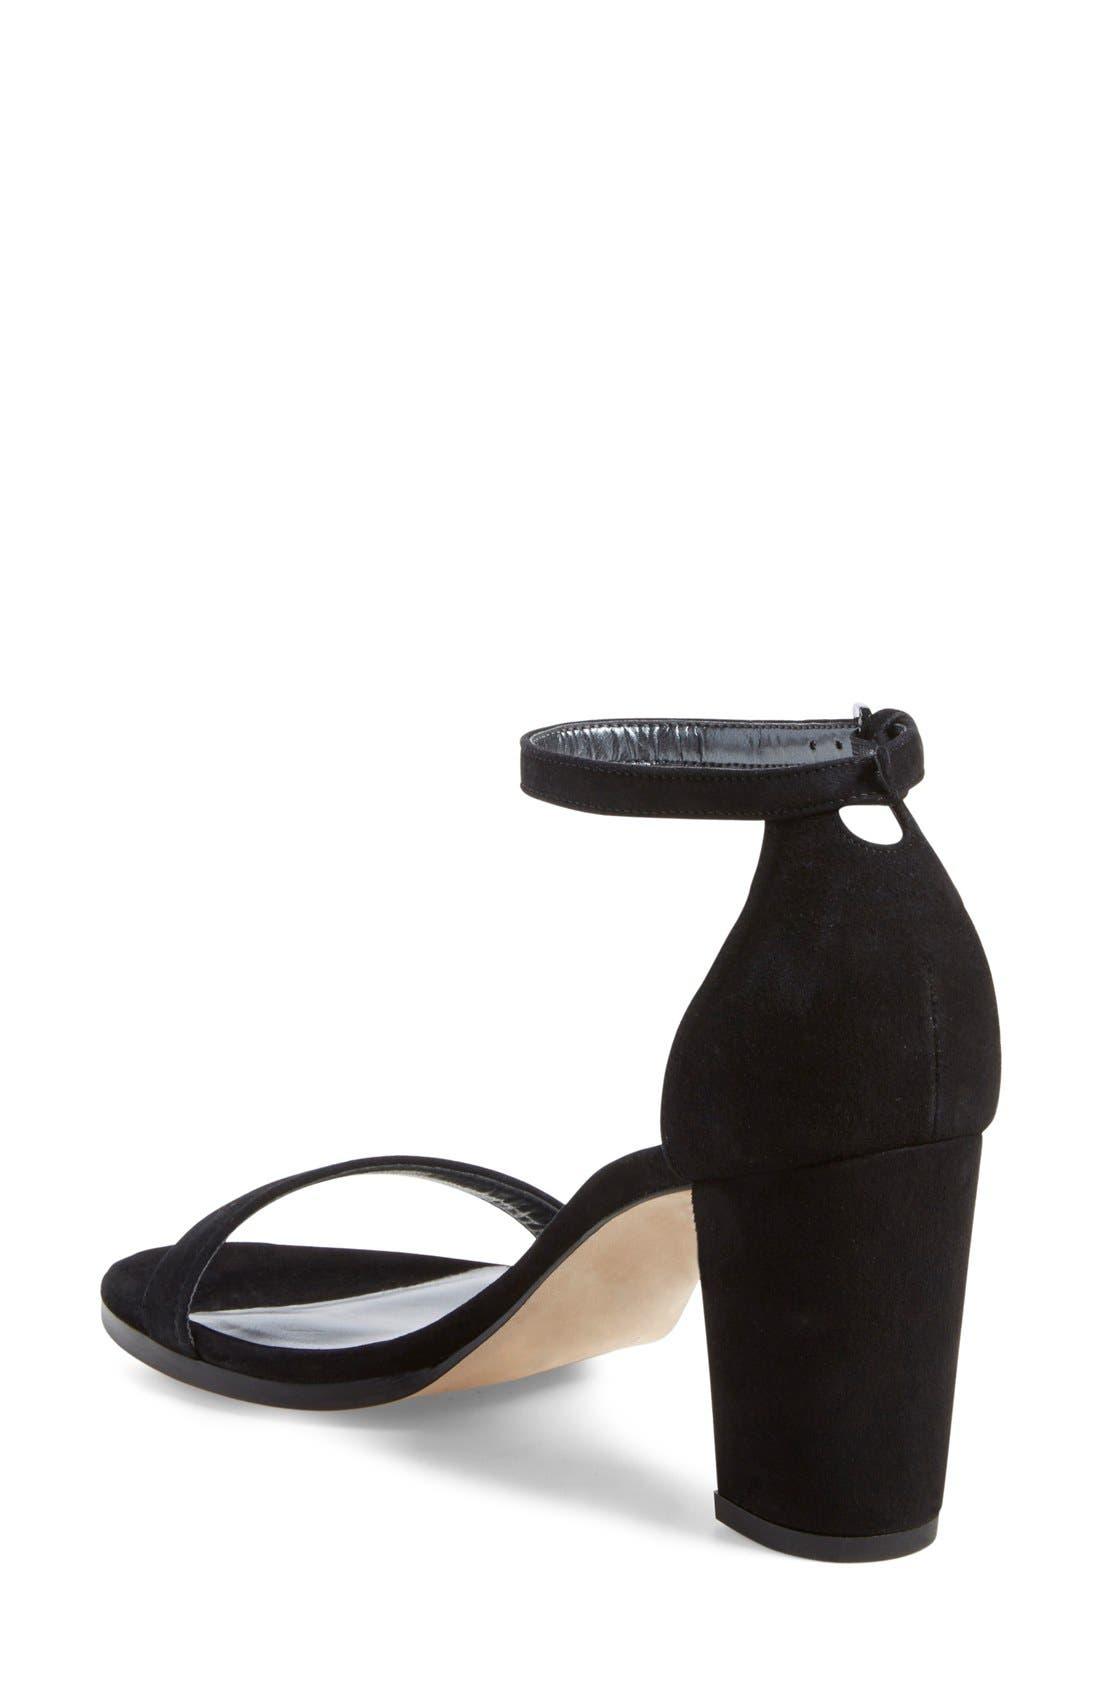 Simple Ankle Strap Sandal,                             Alternate thumbnail 8, color,                             BLACK SUEDE